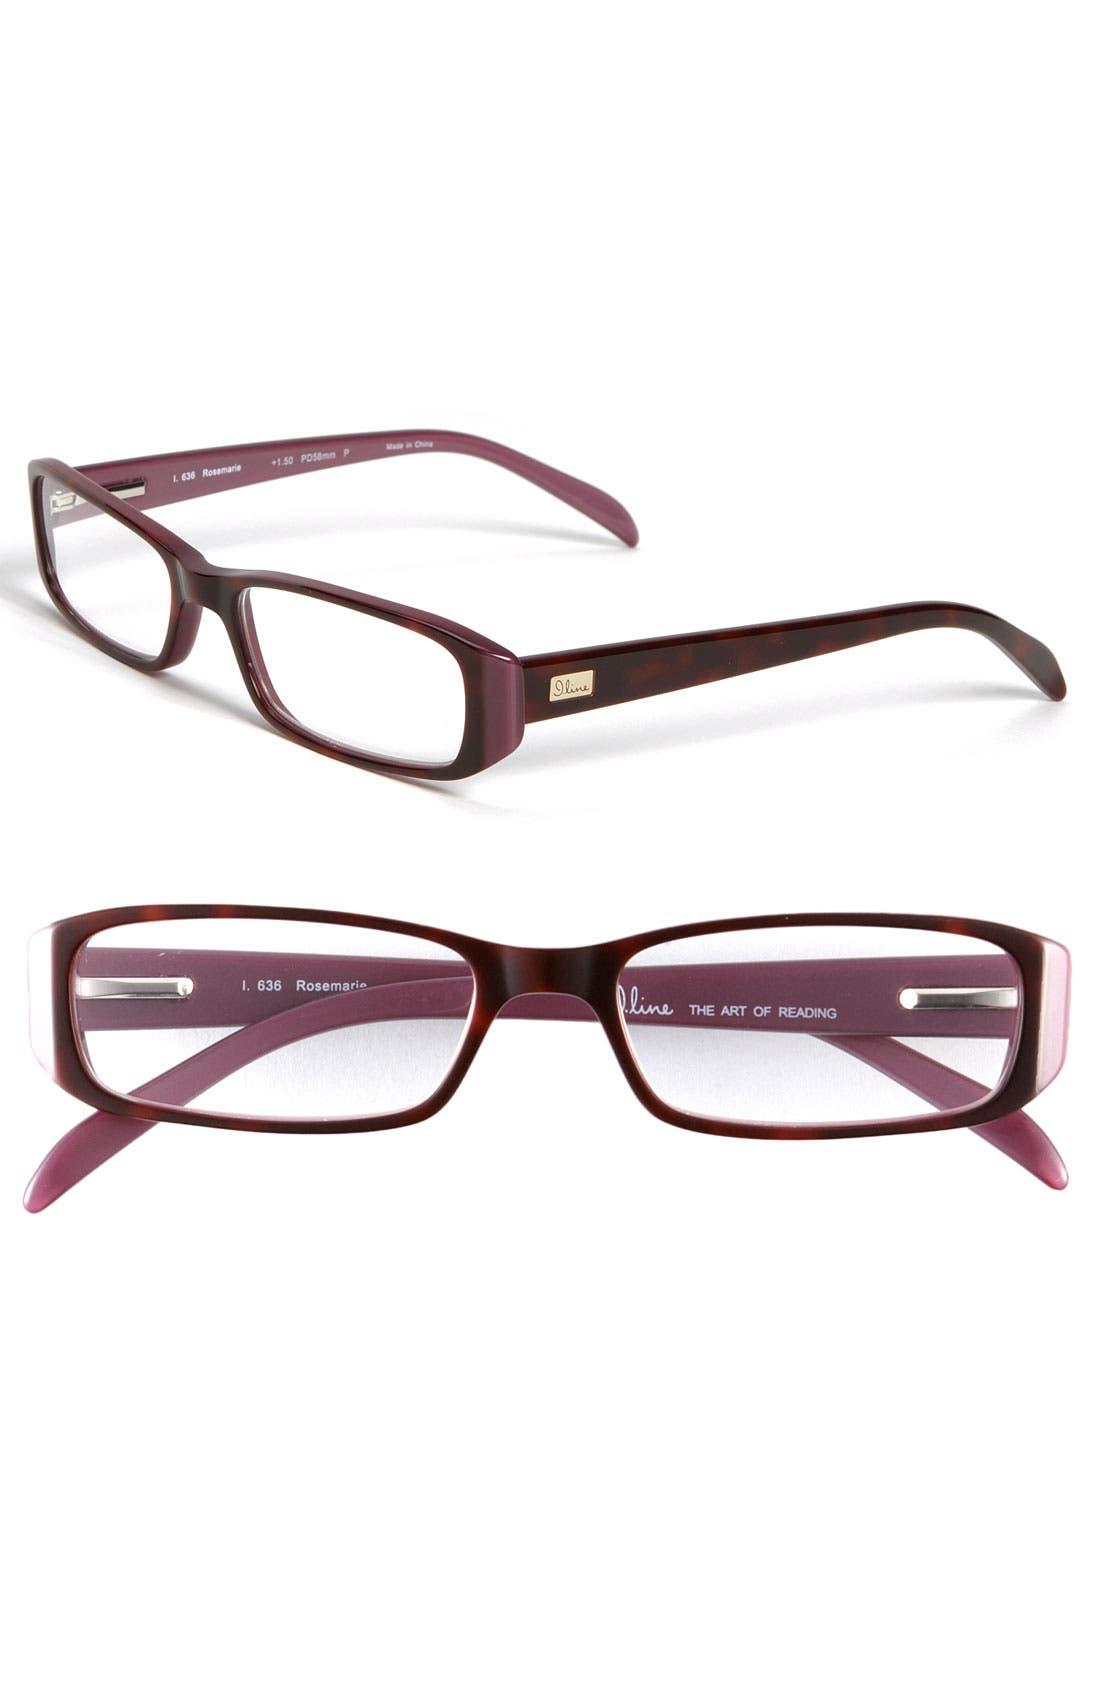 Alternate Image 1 Selected - I Line Eyewear 'Rosemarie' Reading Glasses